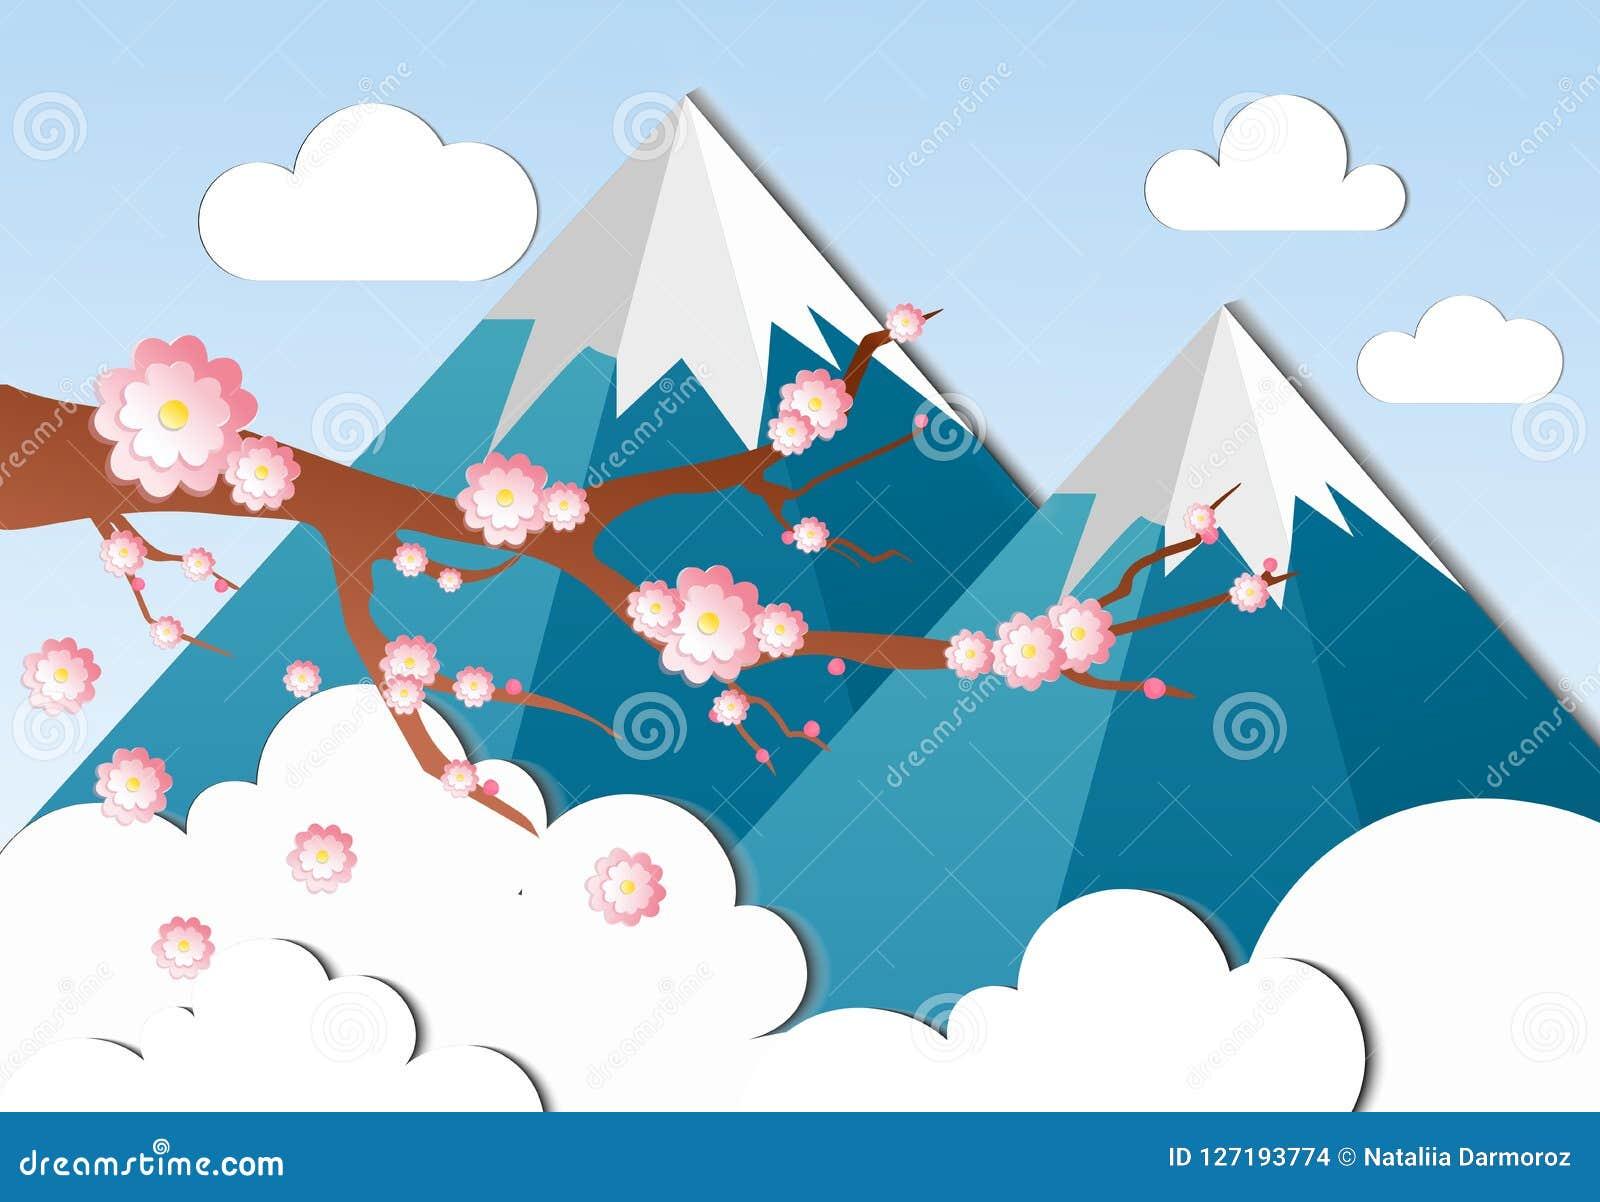 Graphic design Art Cobalt blue, volcano transparent background PNG clipart    HiClipart